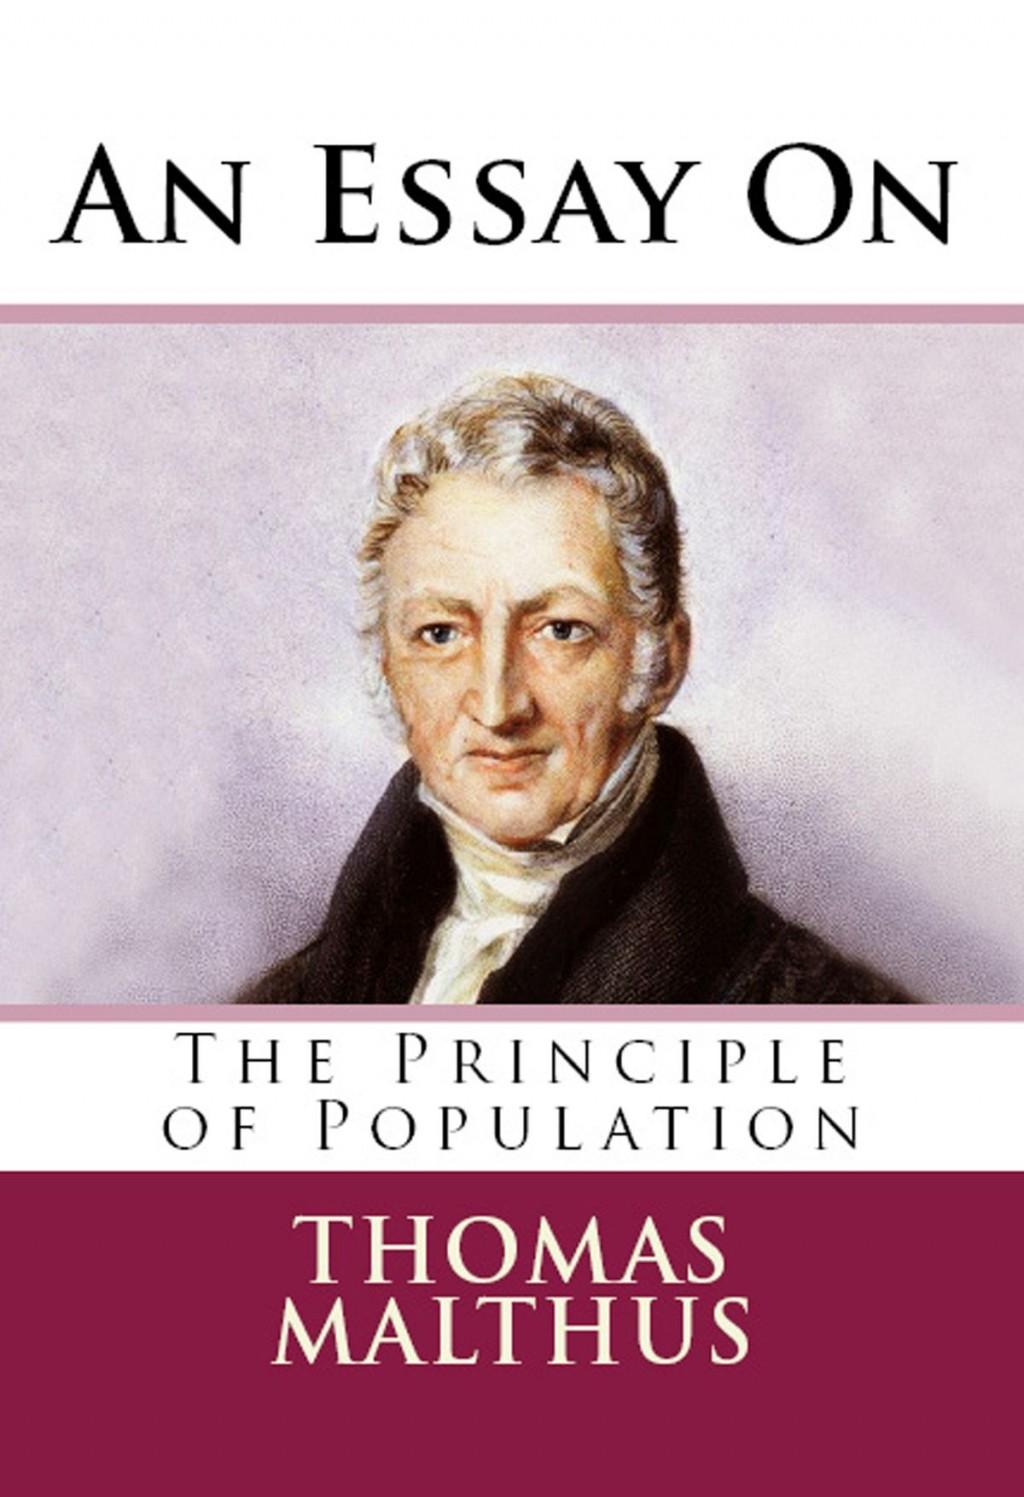 010 Essay On The Principle Of Population An Singular Pdf By Thomas Malthus Main Idea Large